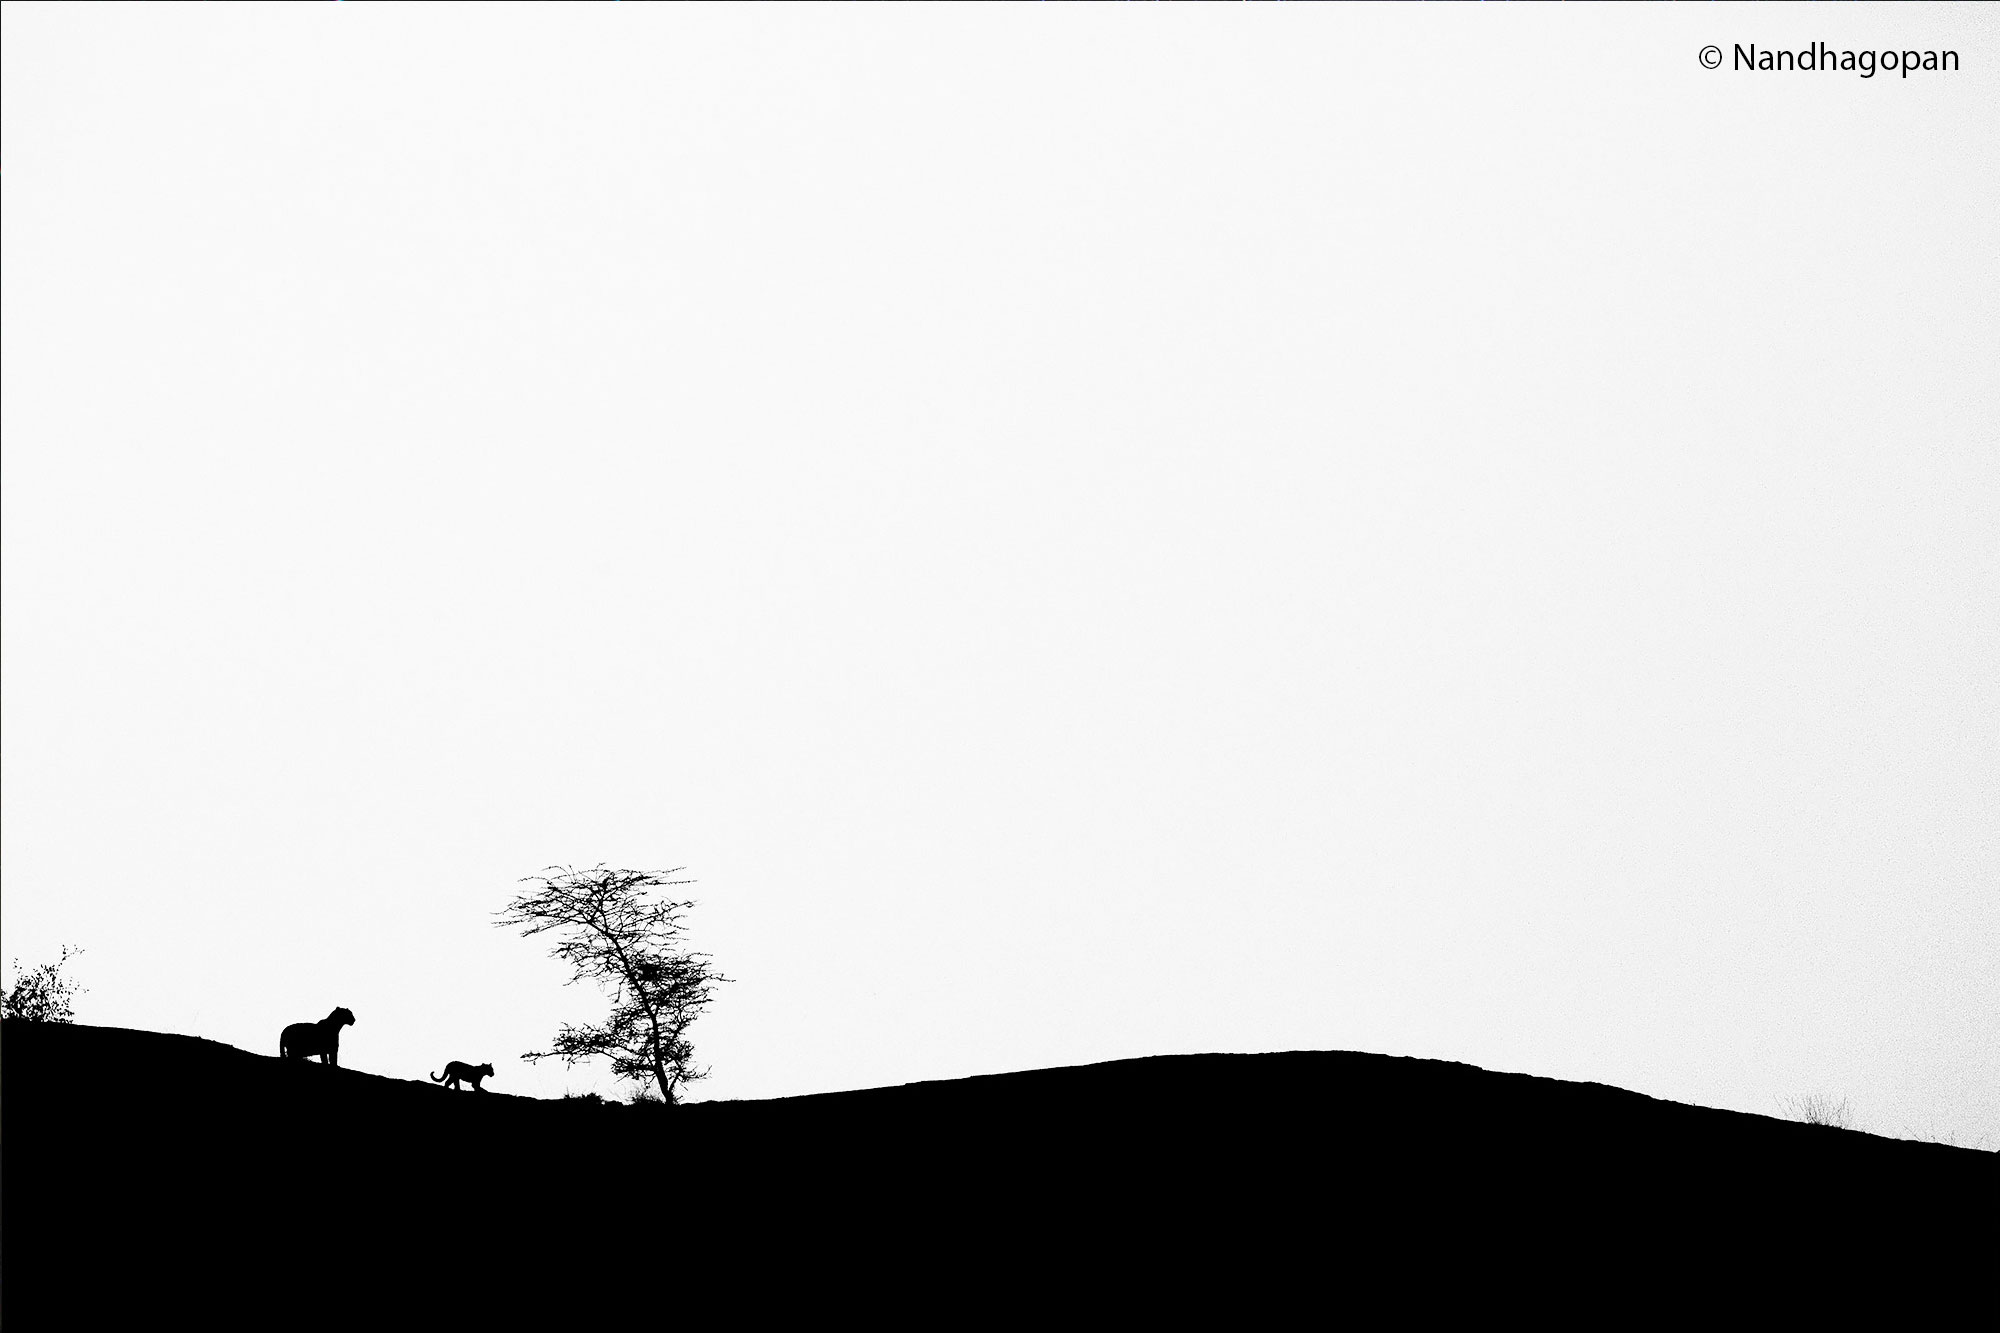 © Nandhagopan